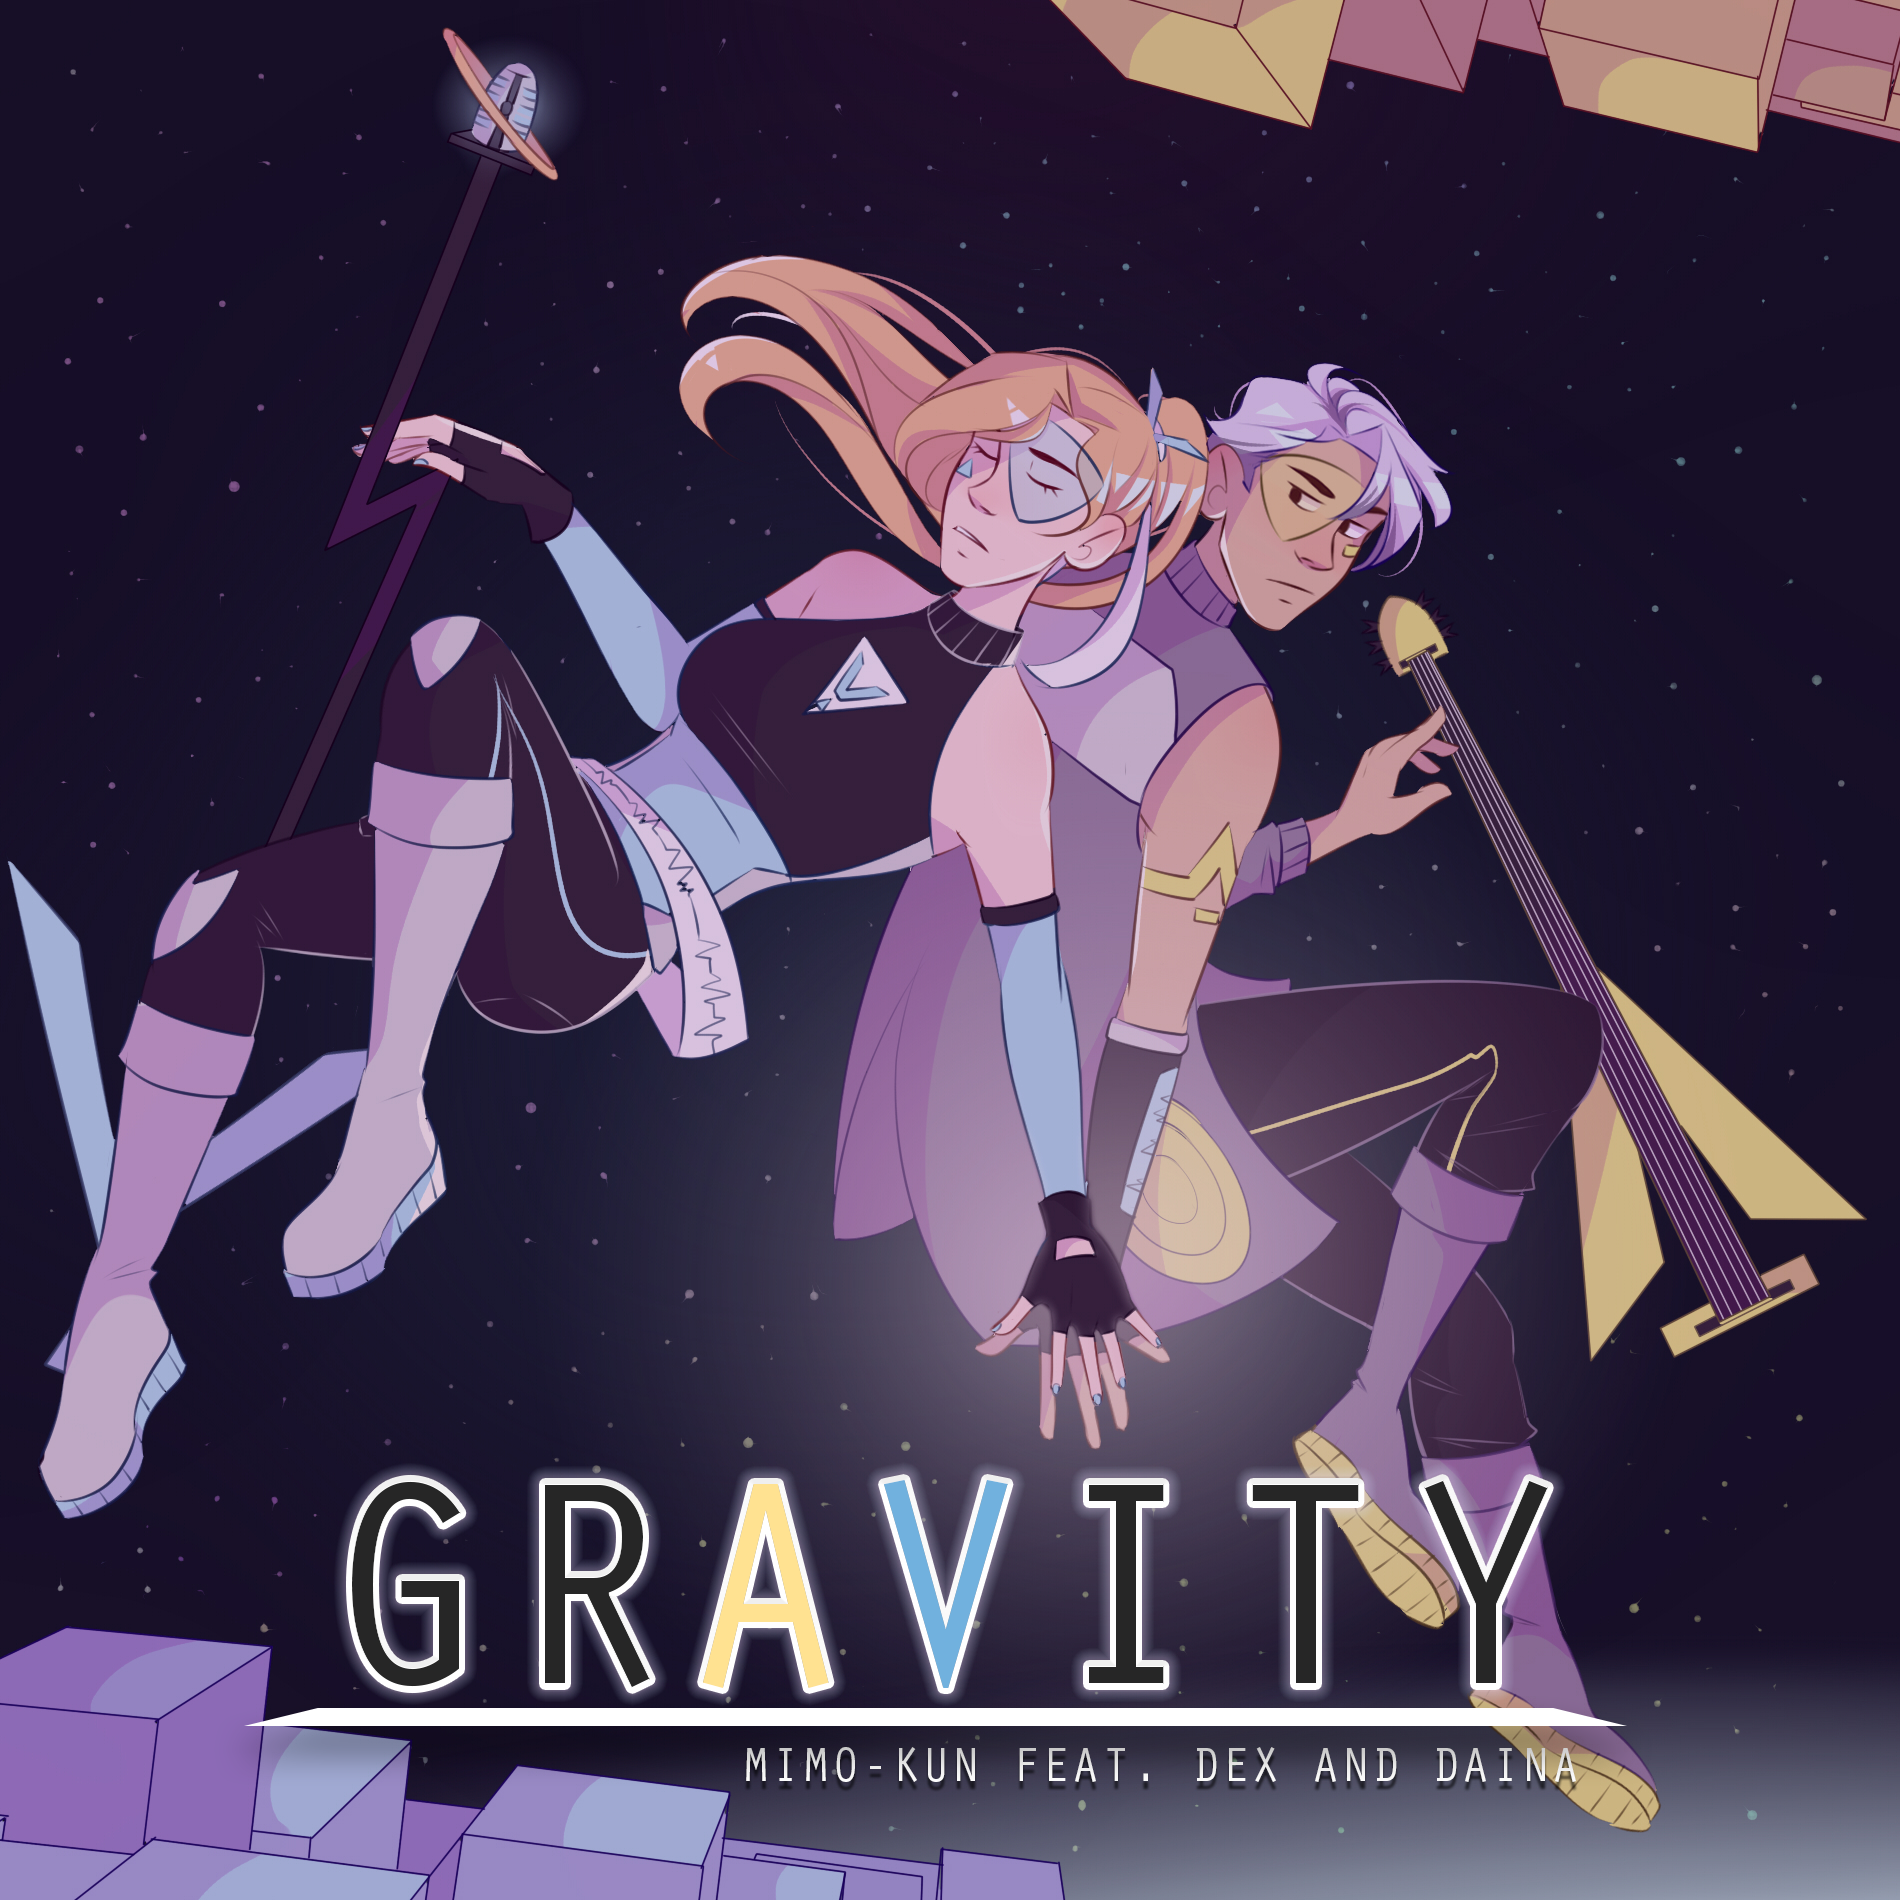 GRAVITY/Mimo-kun